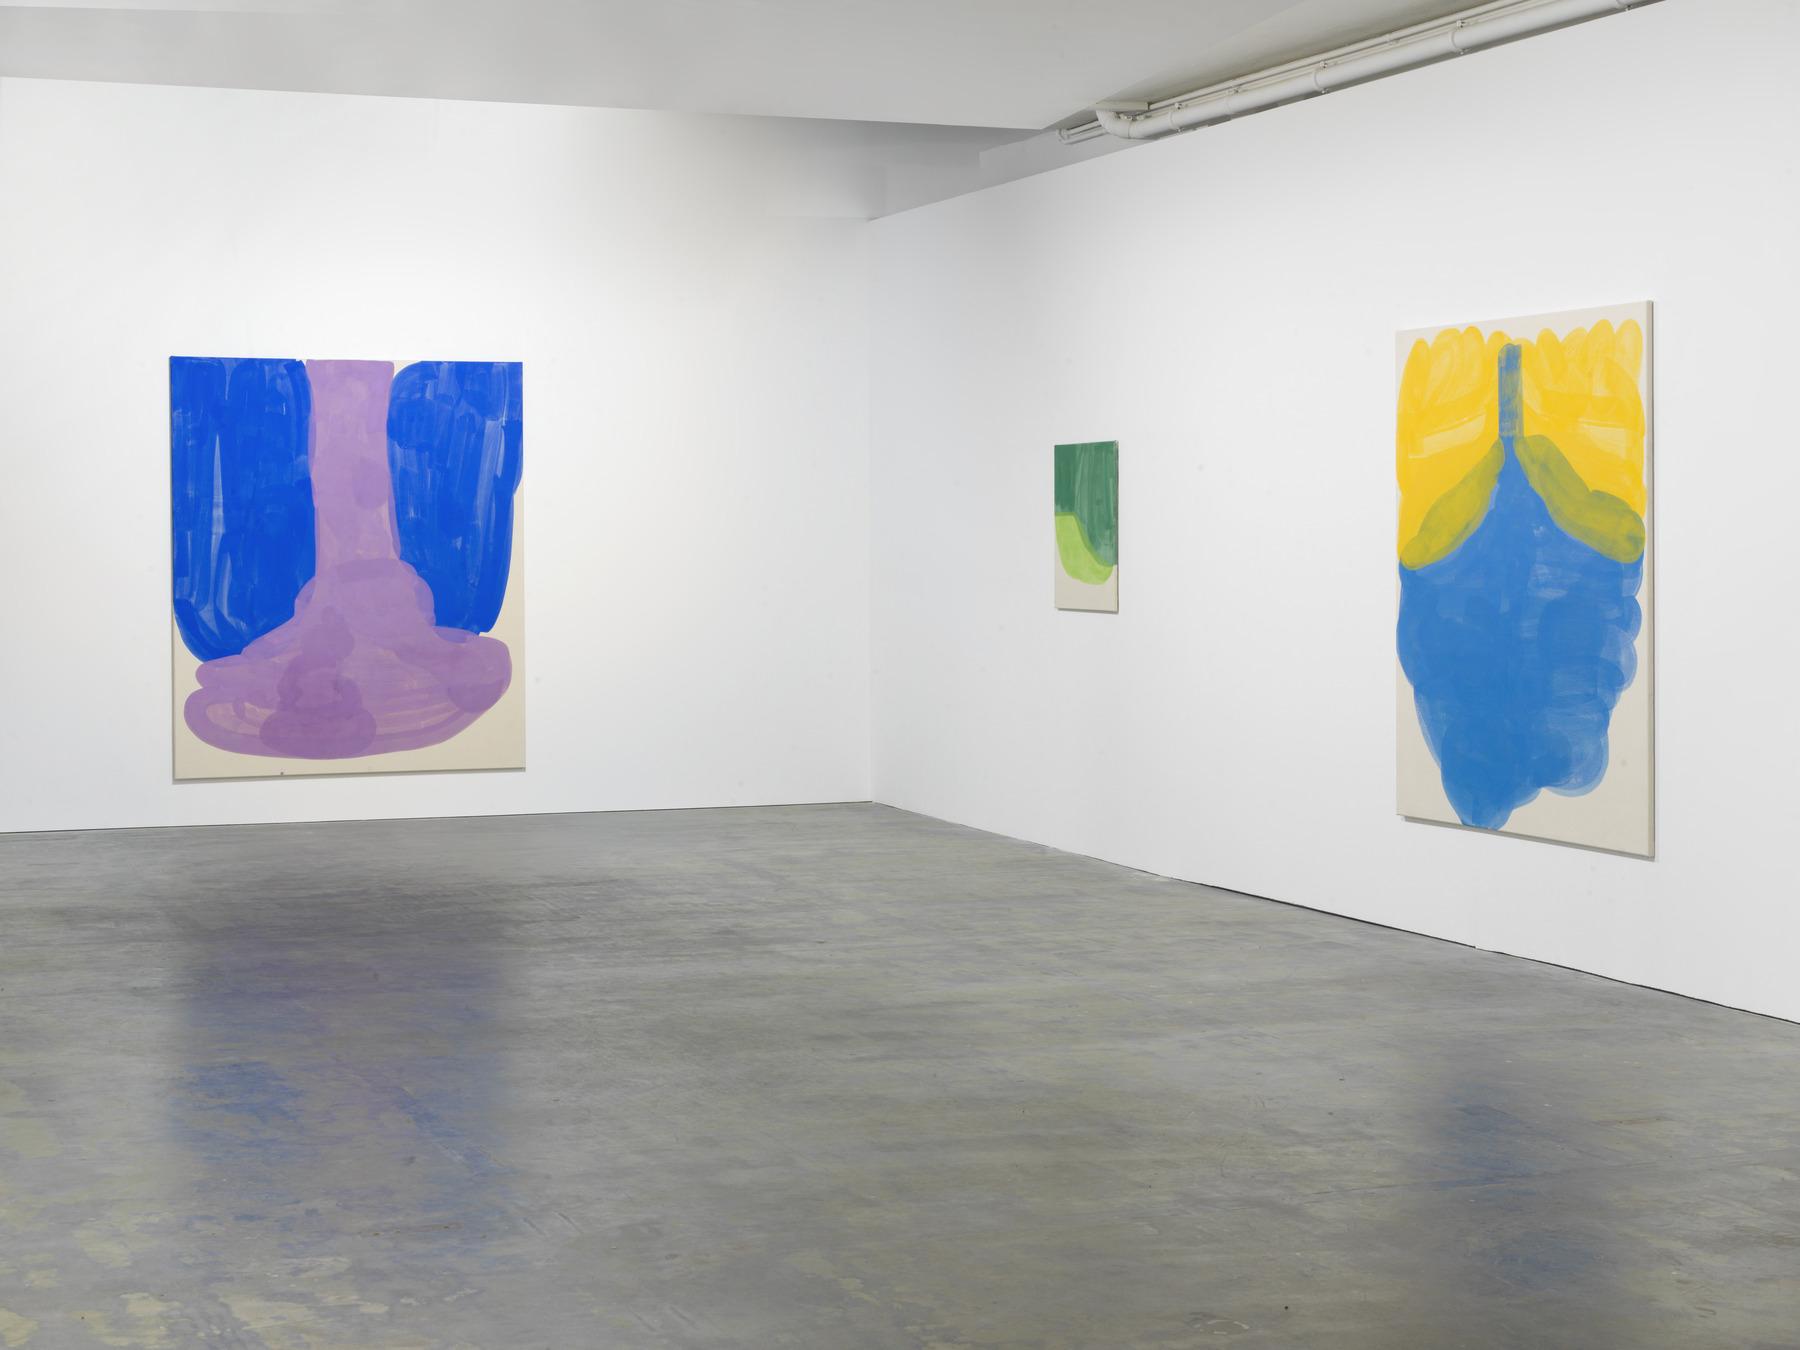 Tamina Amadyar_10,000 hours_Galerie Guido W. Baudach, Berlin_04